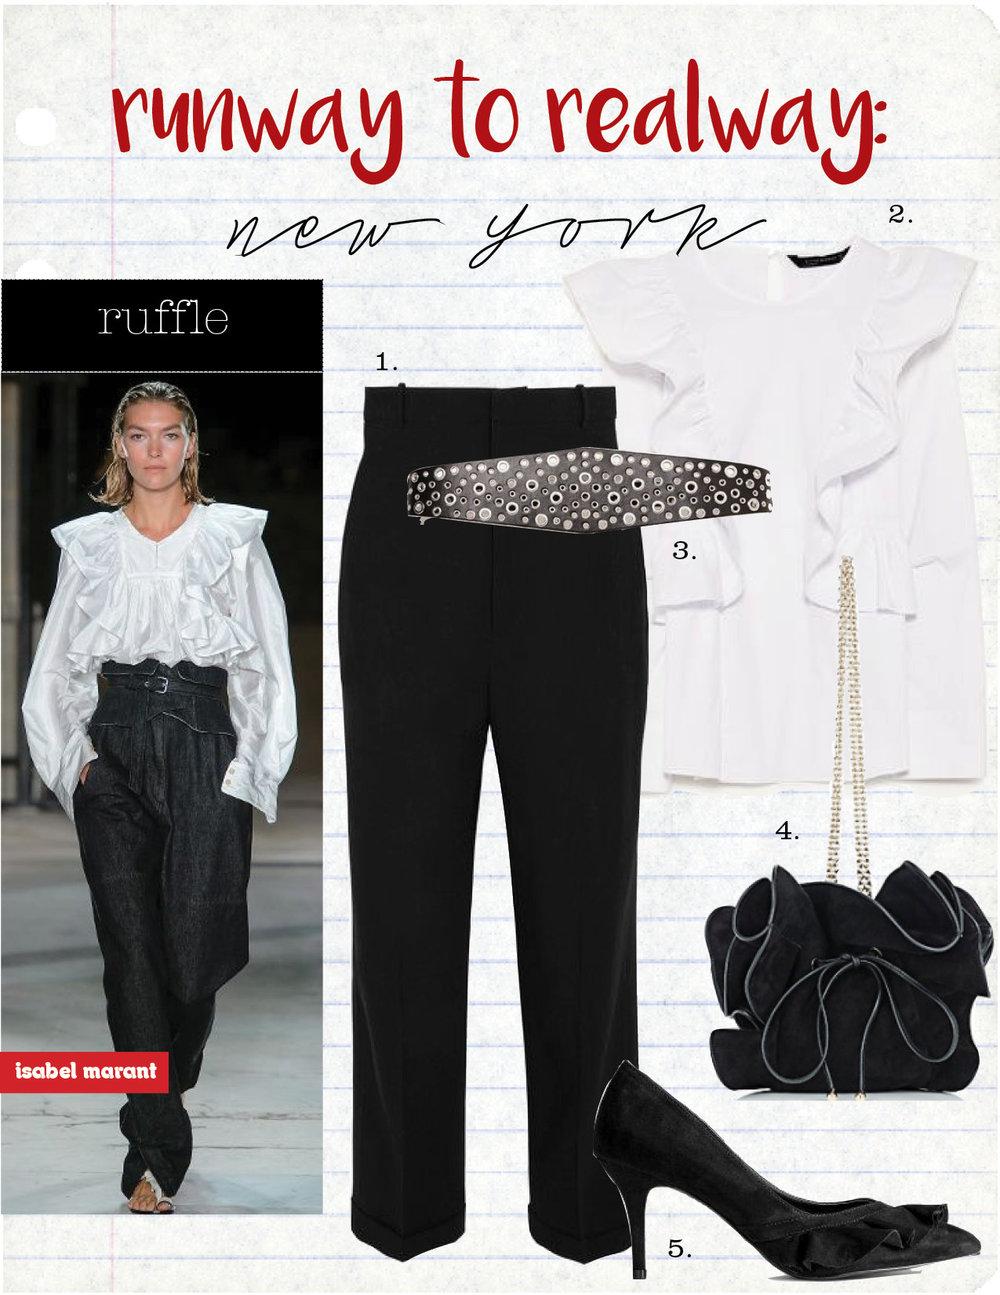 1. jacquemus cropped wool-crepe tapered pants, $570,  net-a-porter.com  2. zara frilled poplin top, $49,  zara.com  3. zara sash-style belt, $29,  zara.com  4. nina ricci lily small bucket bag, $1790,  barneys.com  5. h&m pumps with ruffle, $19,  hm.com